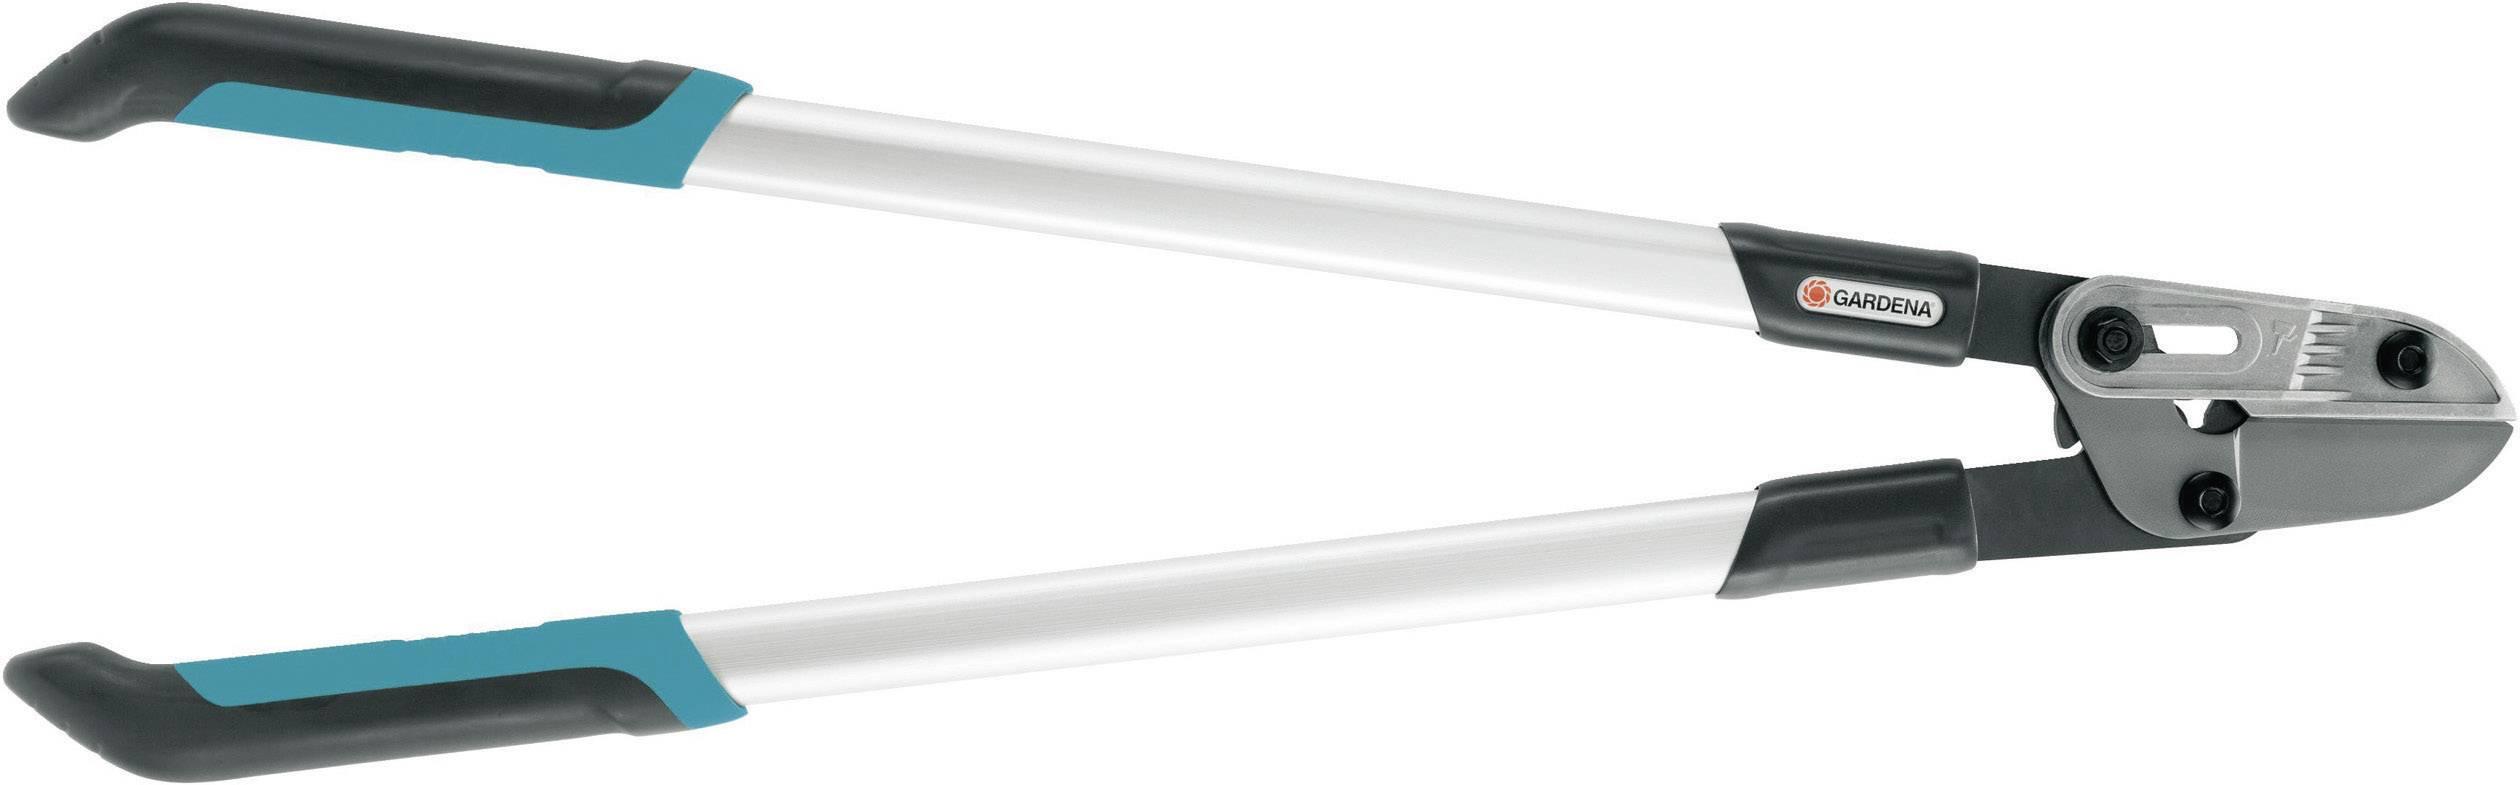 Nožnice na konáre GARDENA Comfort 760 A, 760 mm